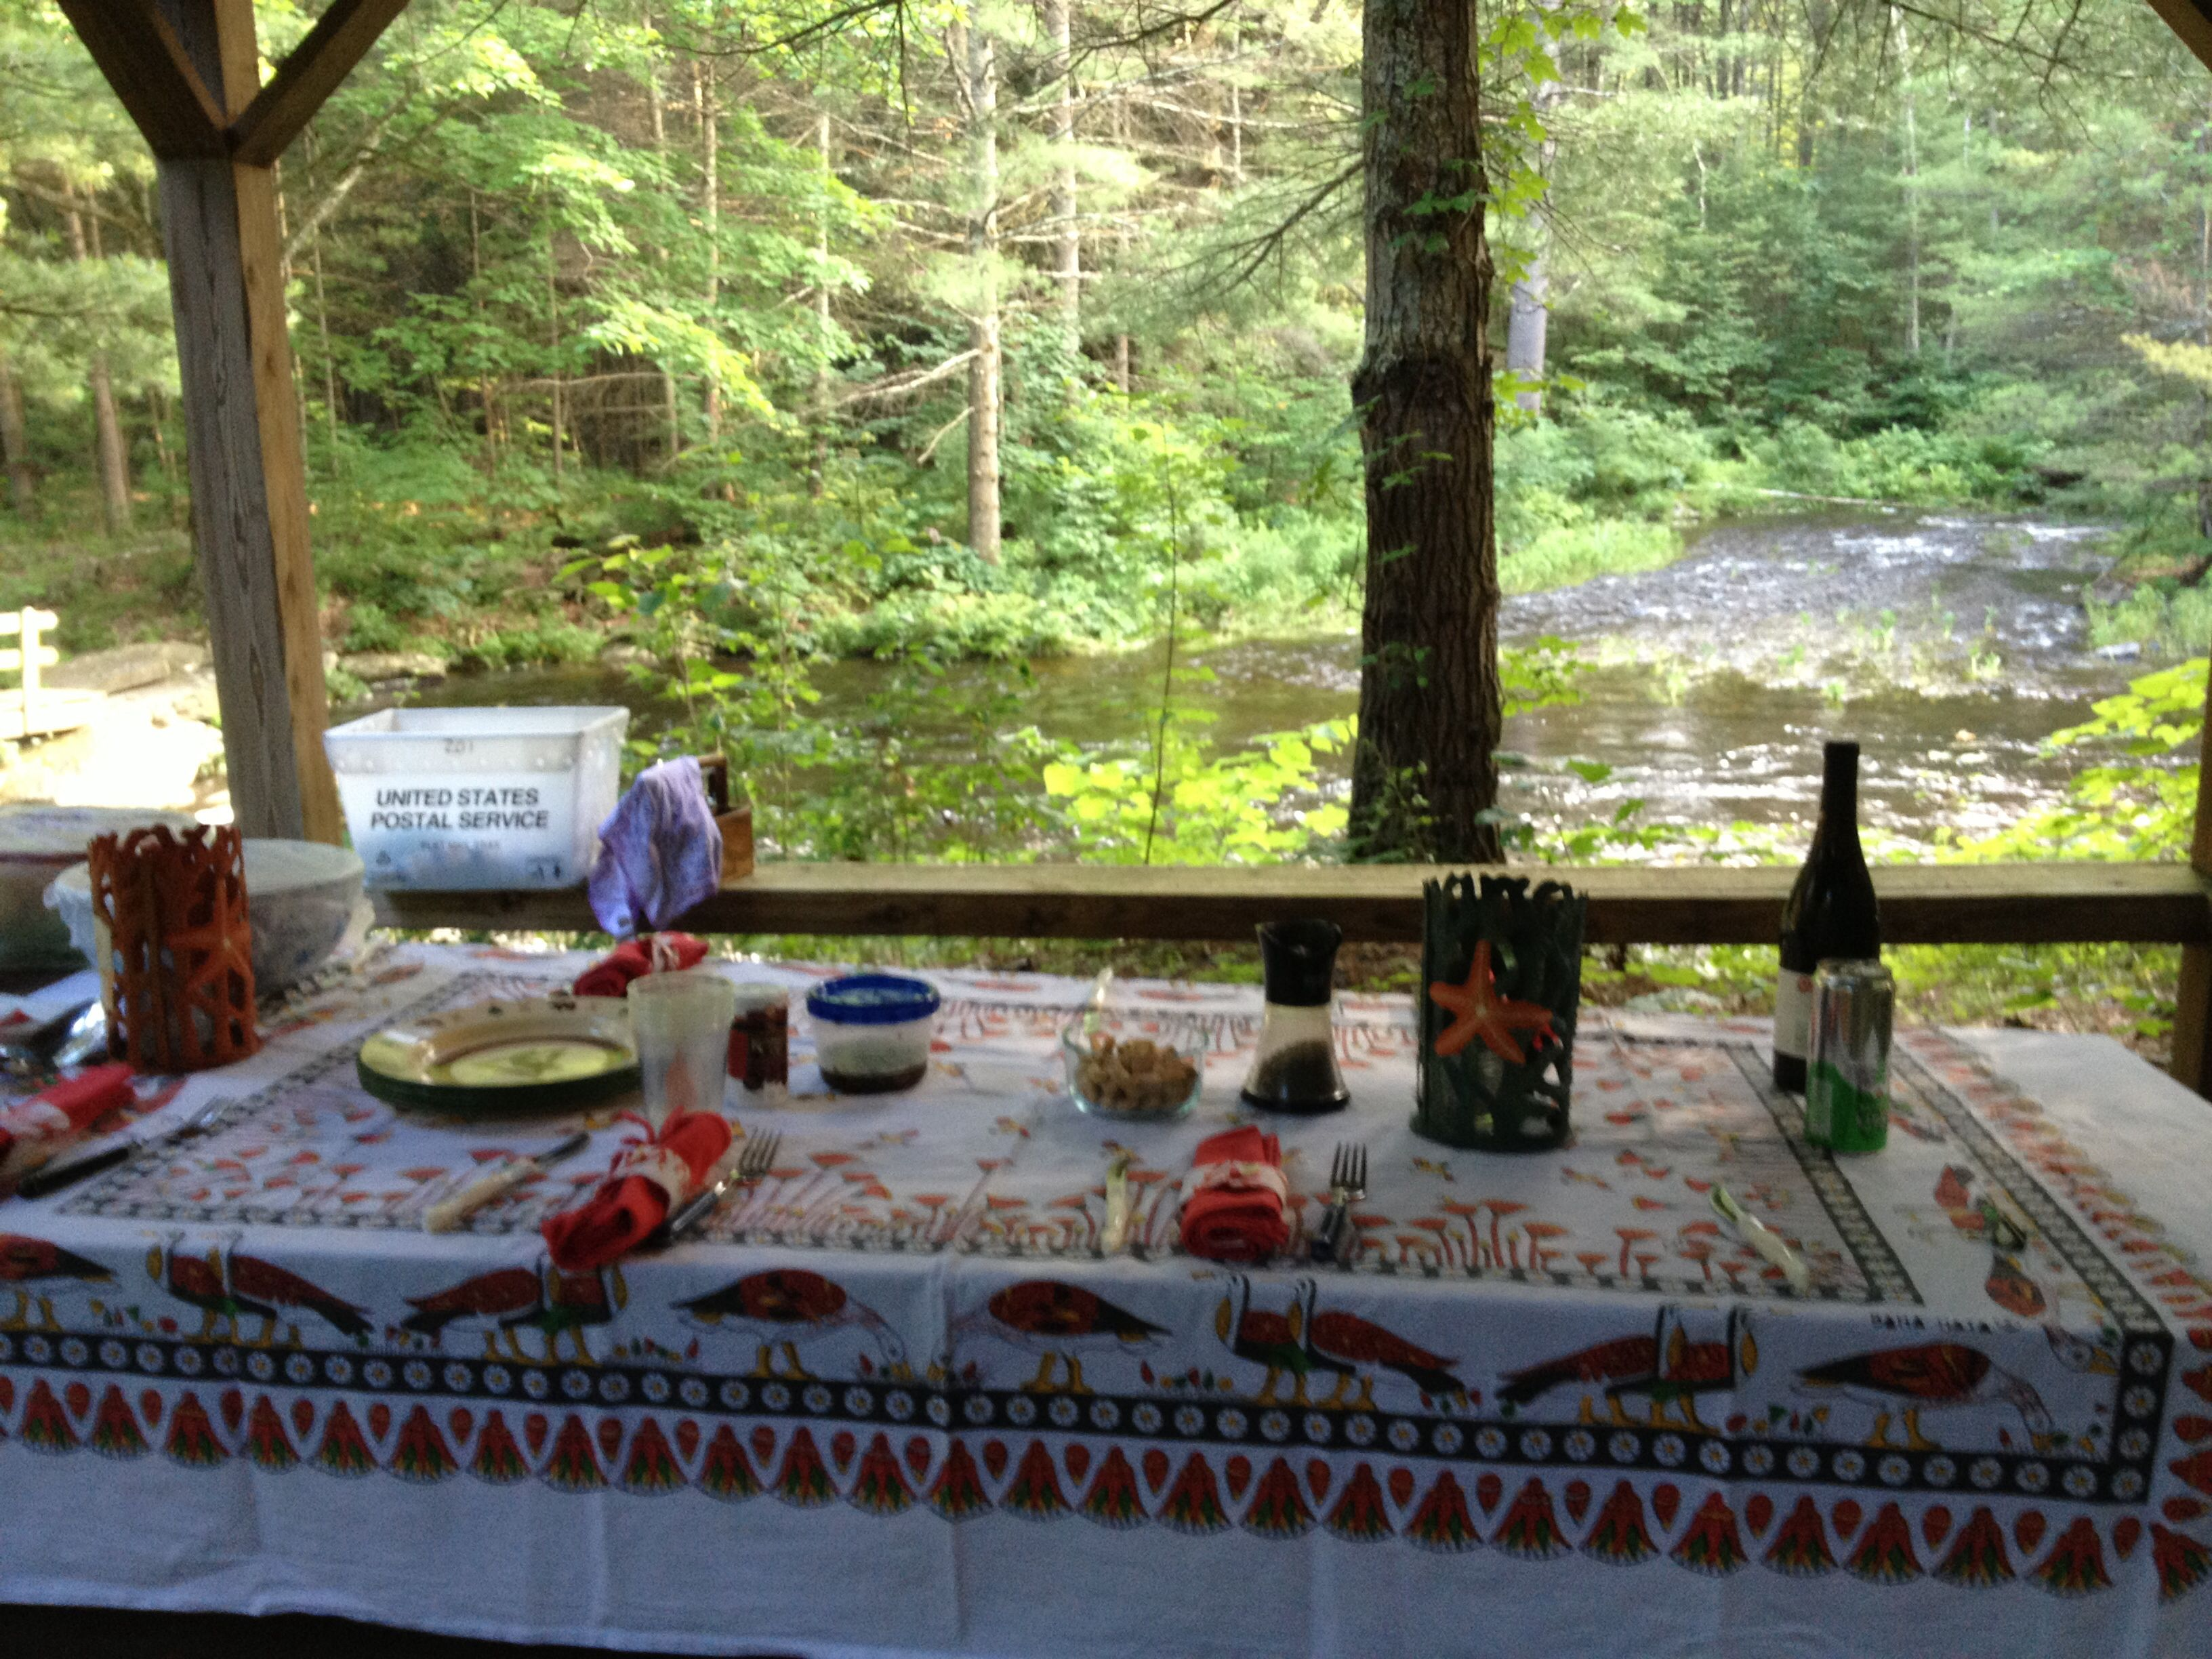 Stream side picnic.